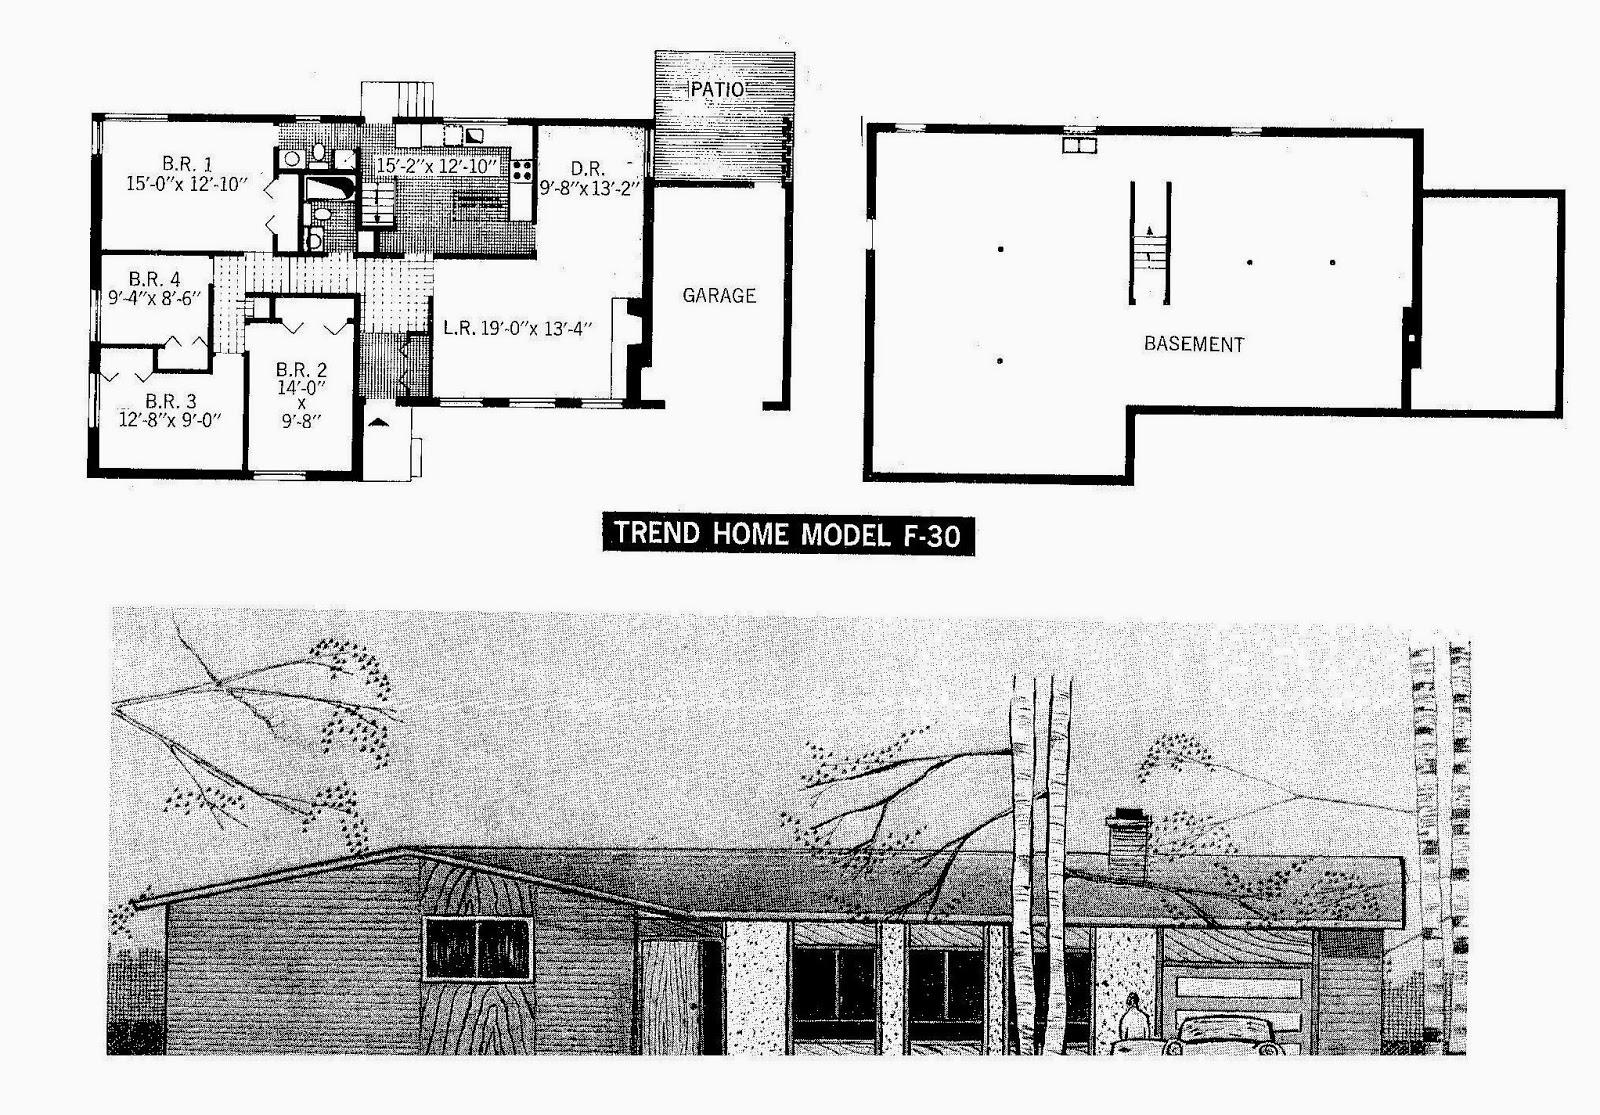 Trend Homes Floor Plans Trend Homes Floor Plans Az Beautiful – Trend Homes Floor Plans Az